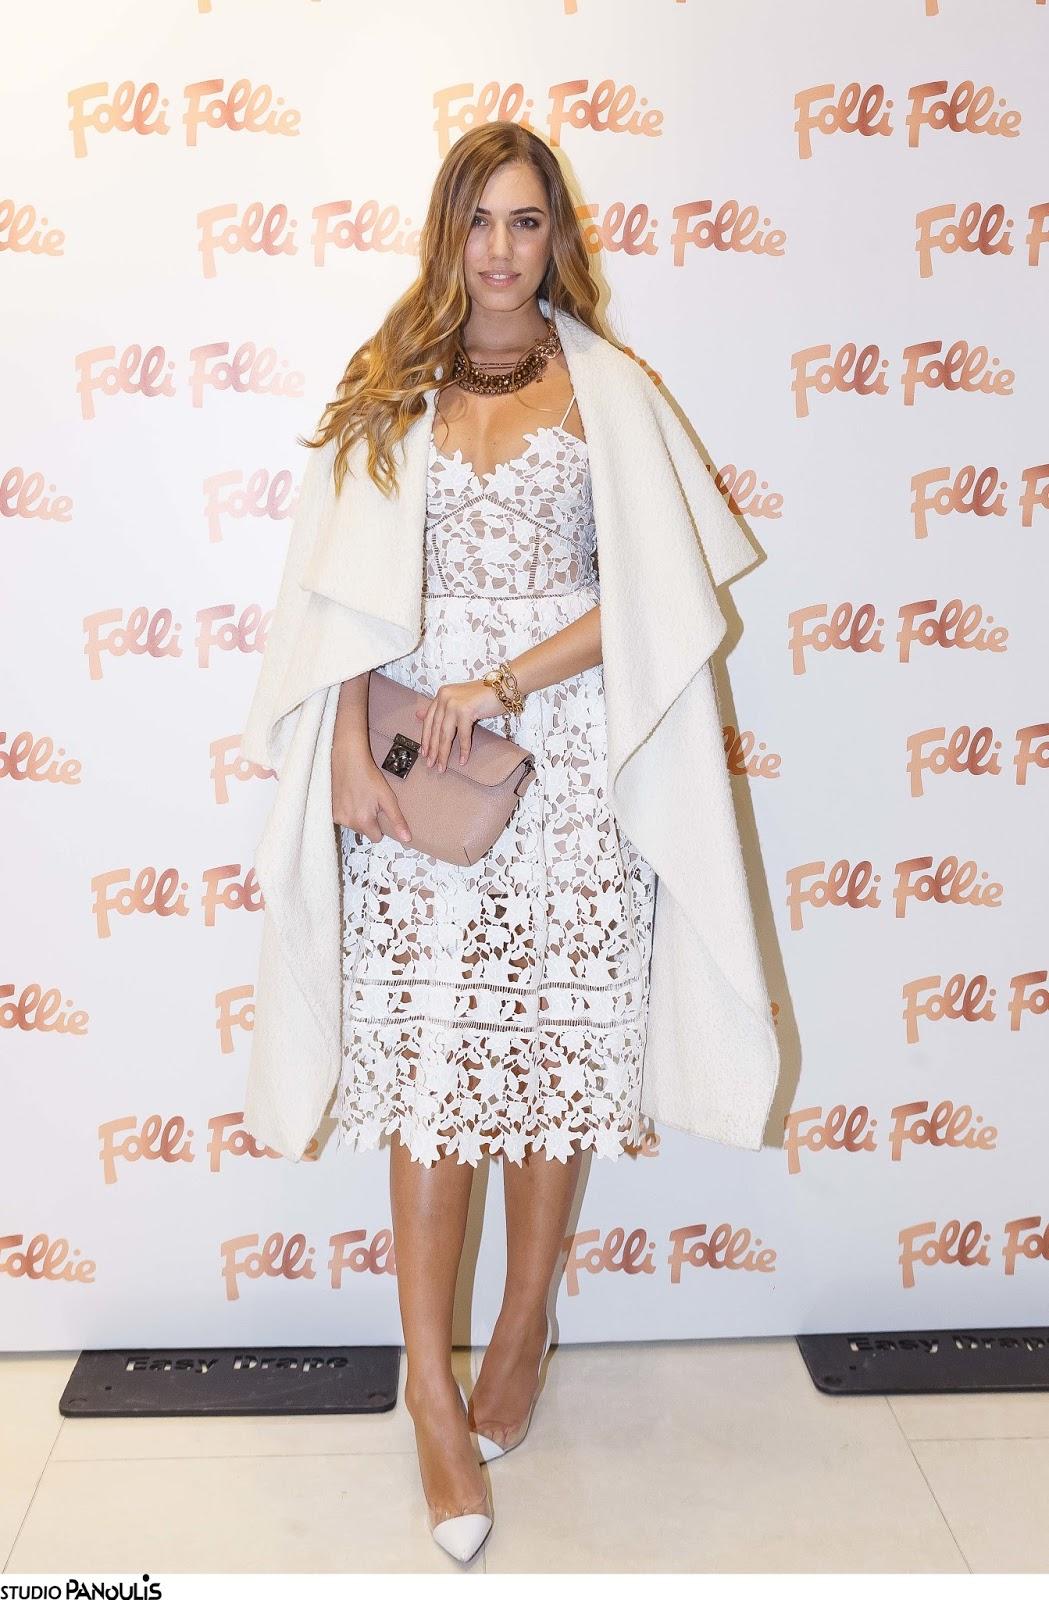 c66d8bcbca Amber Le Bon (wearing  follifollie jewellery and bag